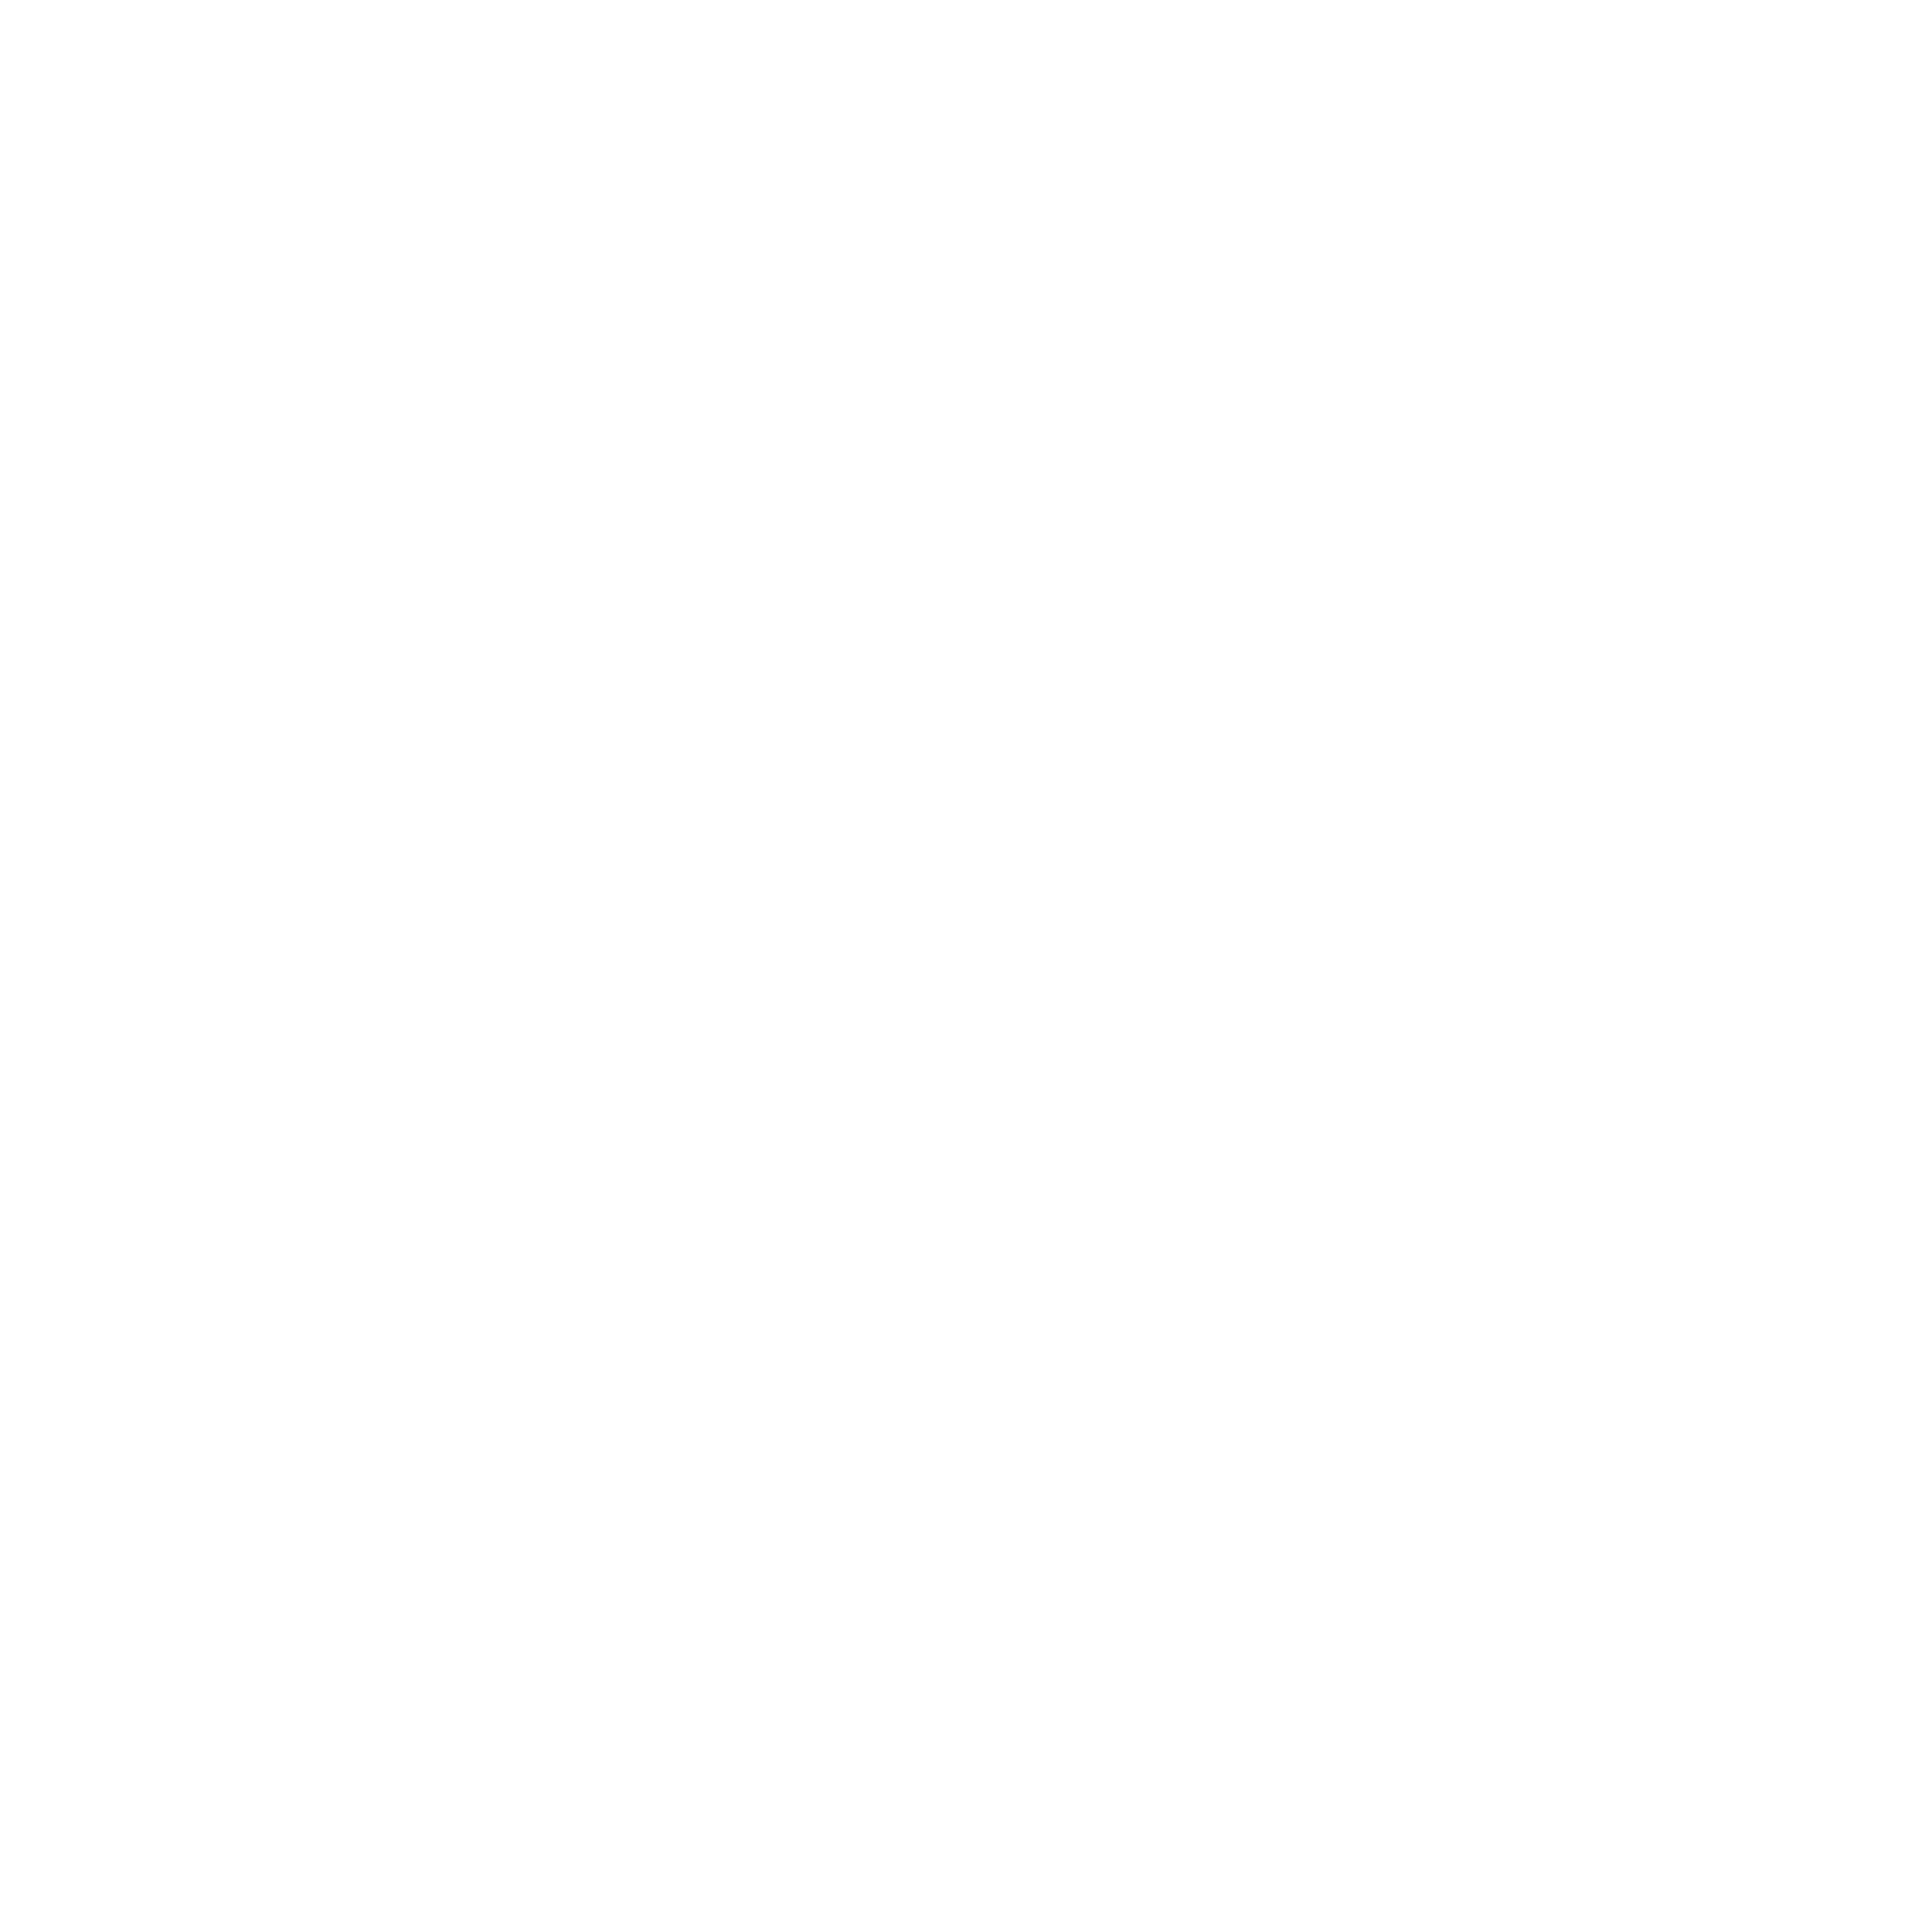 Instagramlogga